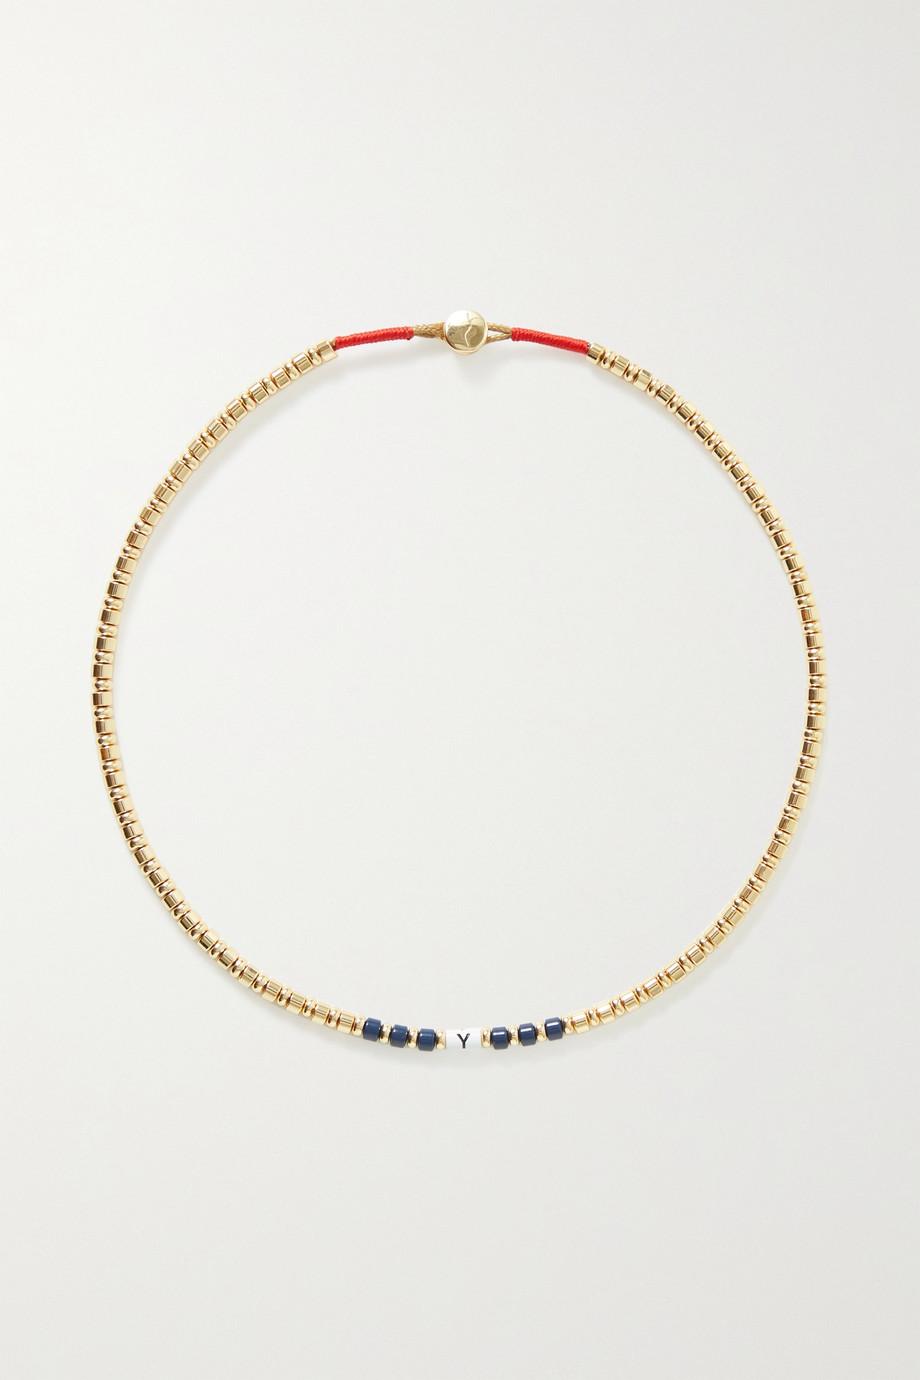 Roxanne Assoulin Little Letters enamel and gold-tone necklace